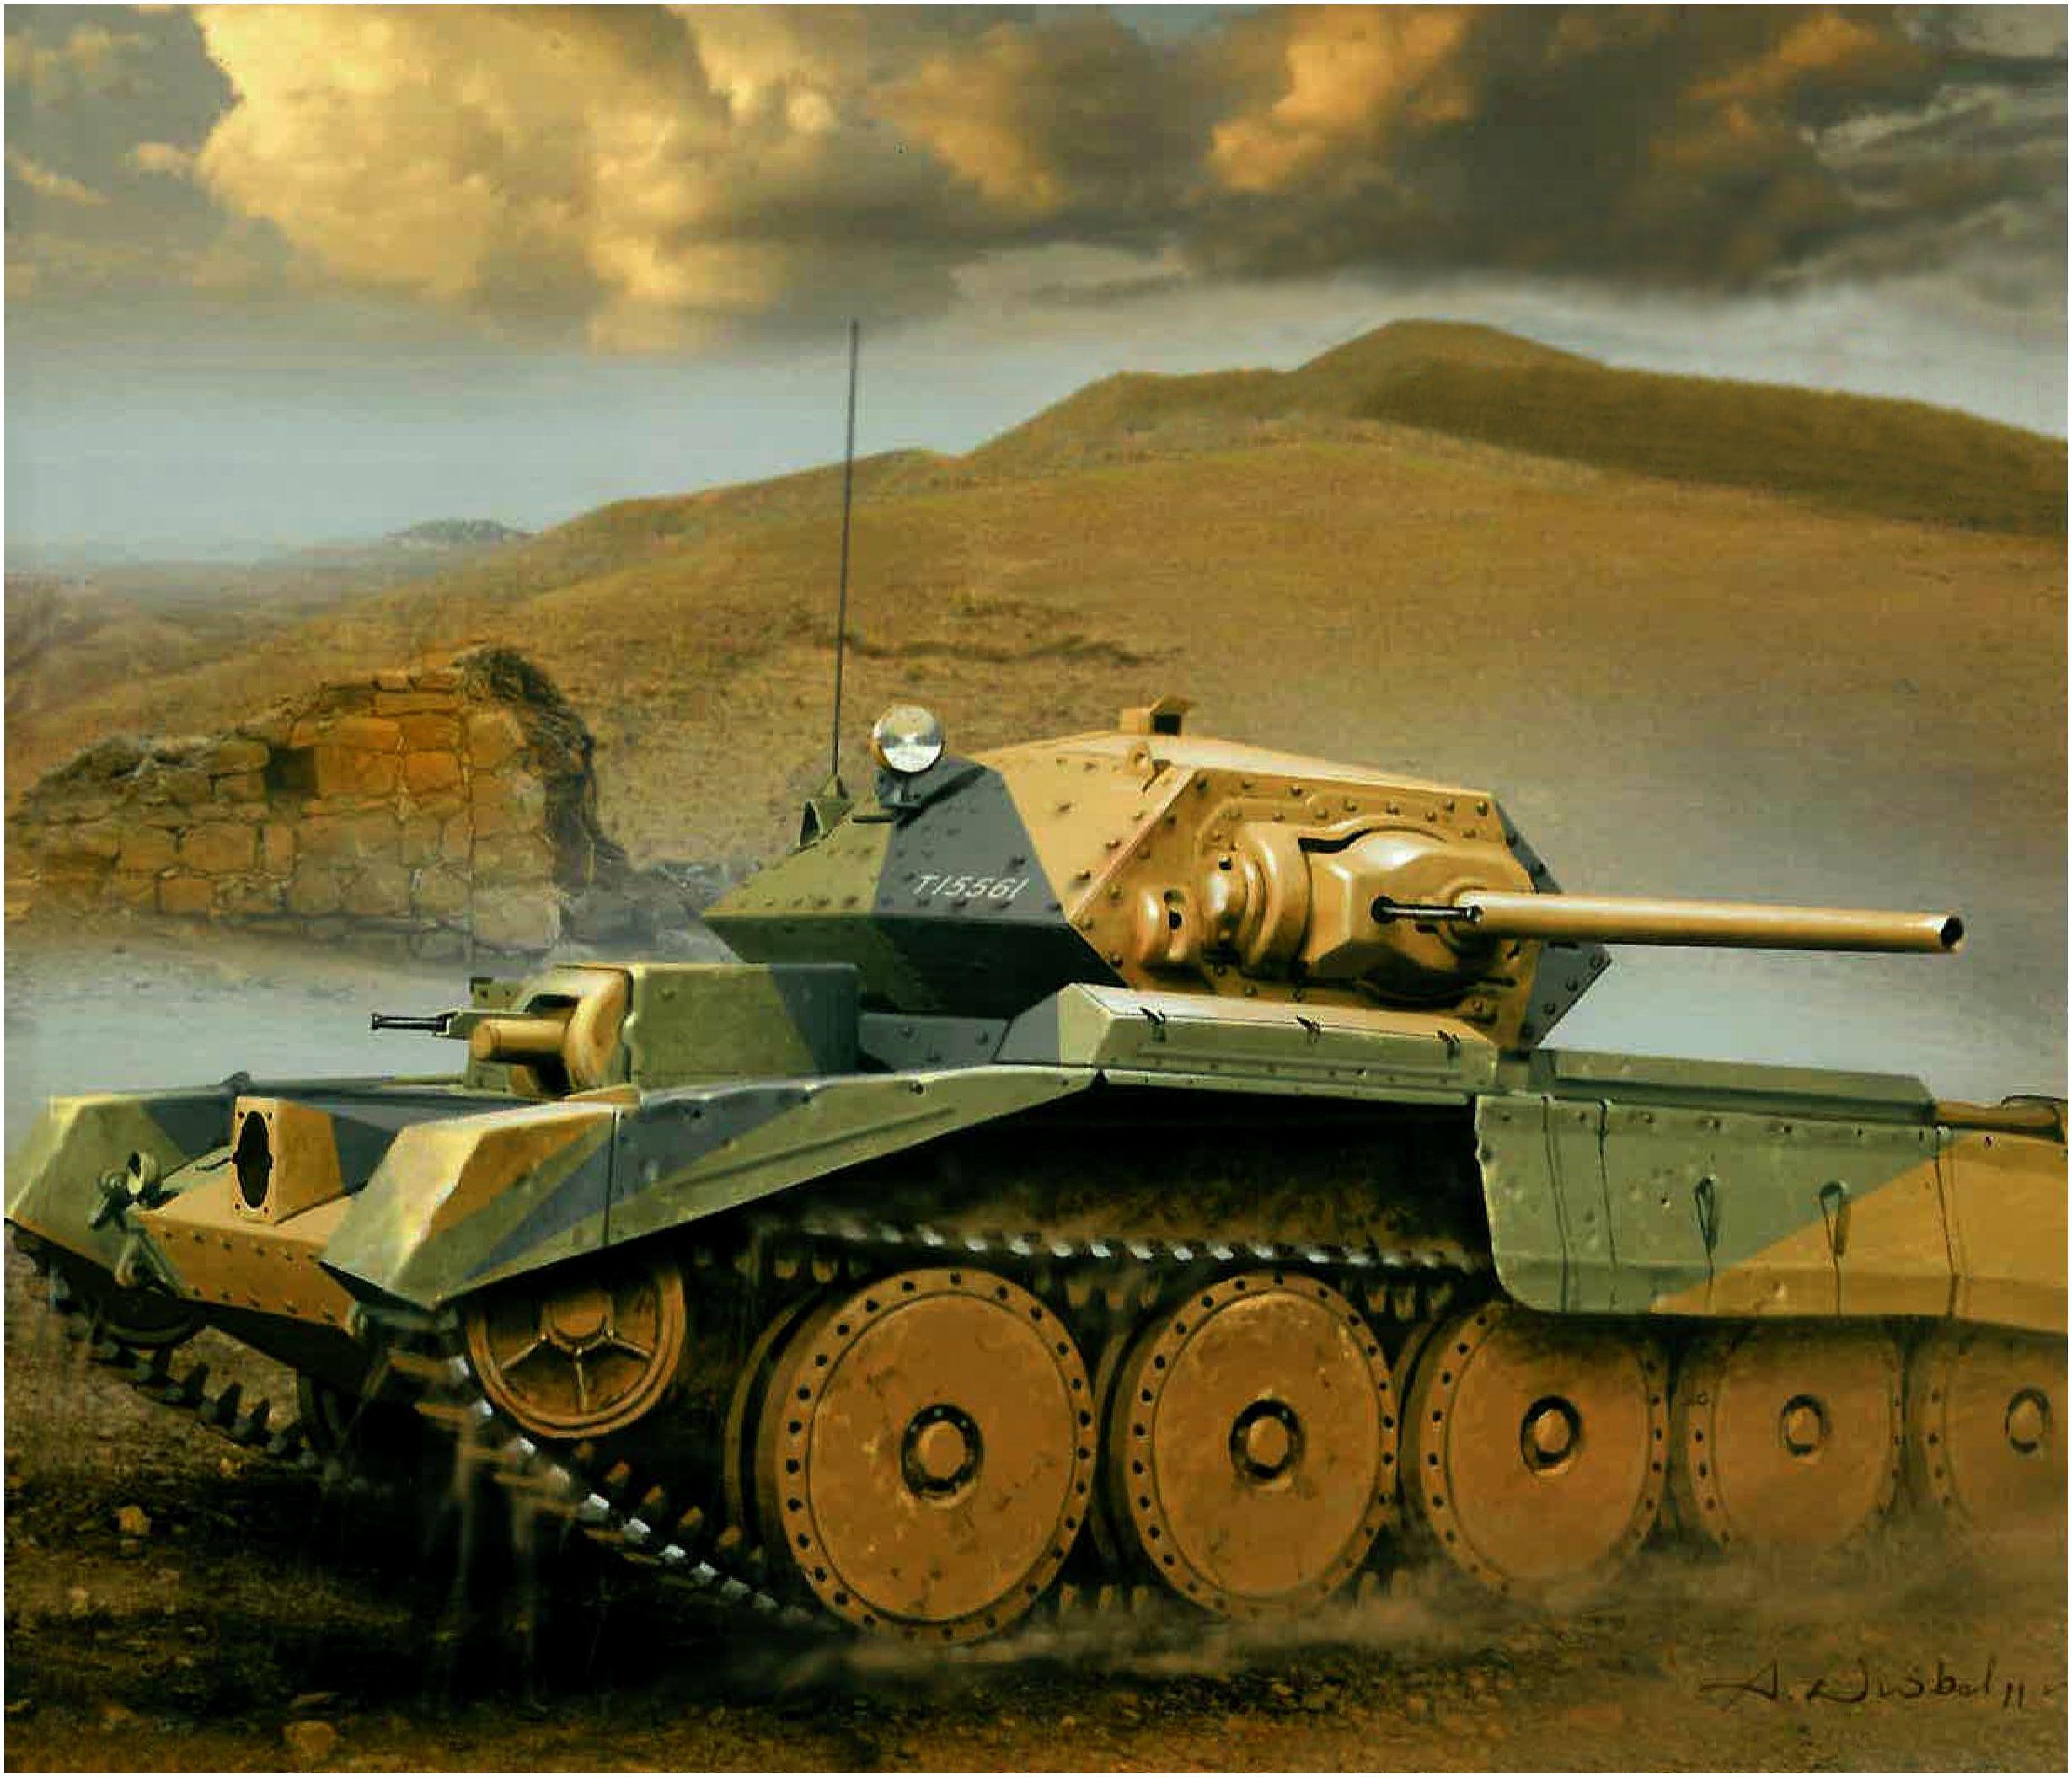 Wróbel Arkadiusz. Танк Crusader Mk.II.